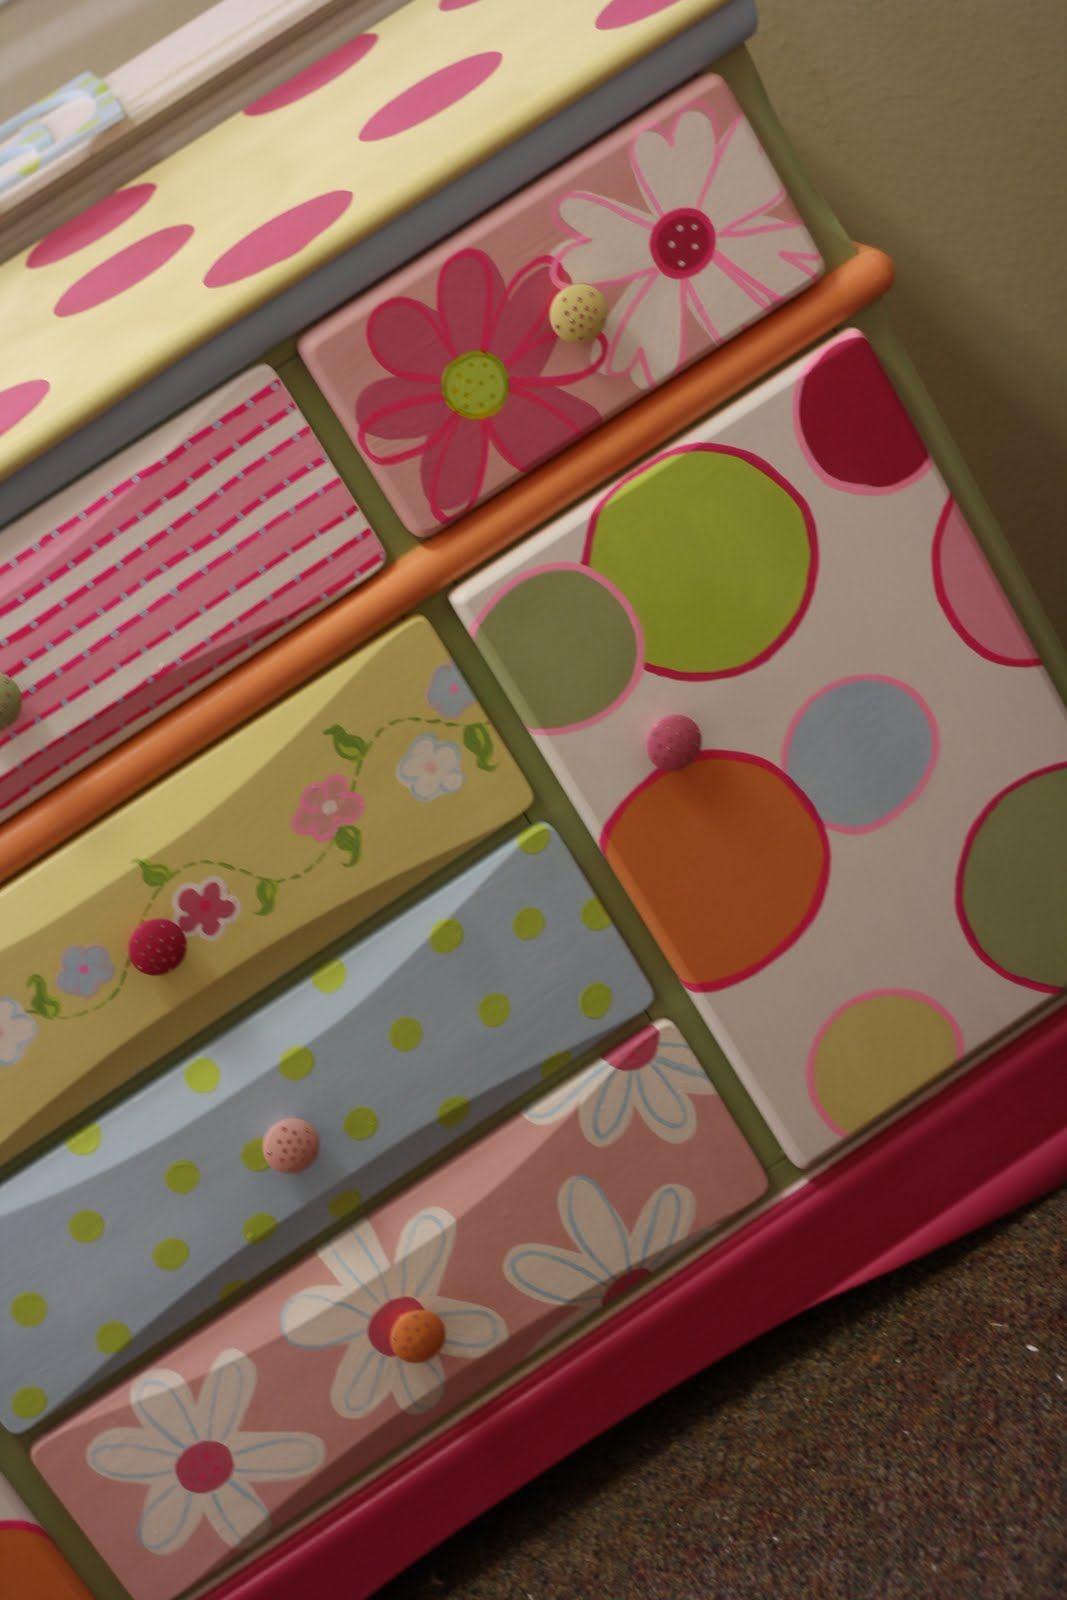 Sparkles: REESE's Headboard, Footboard, Dresser & Wall Letters